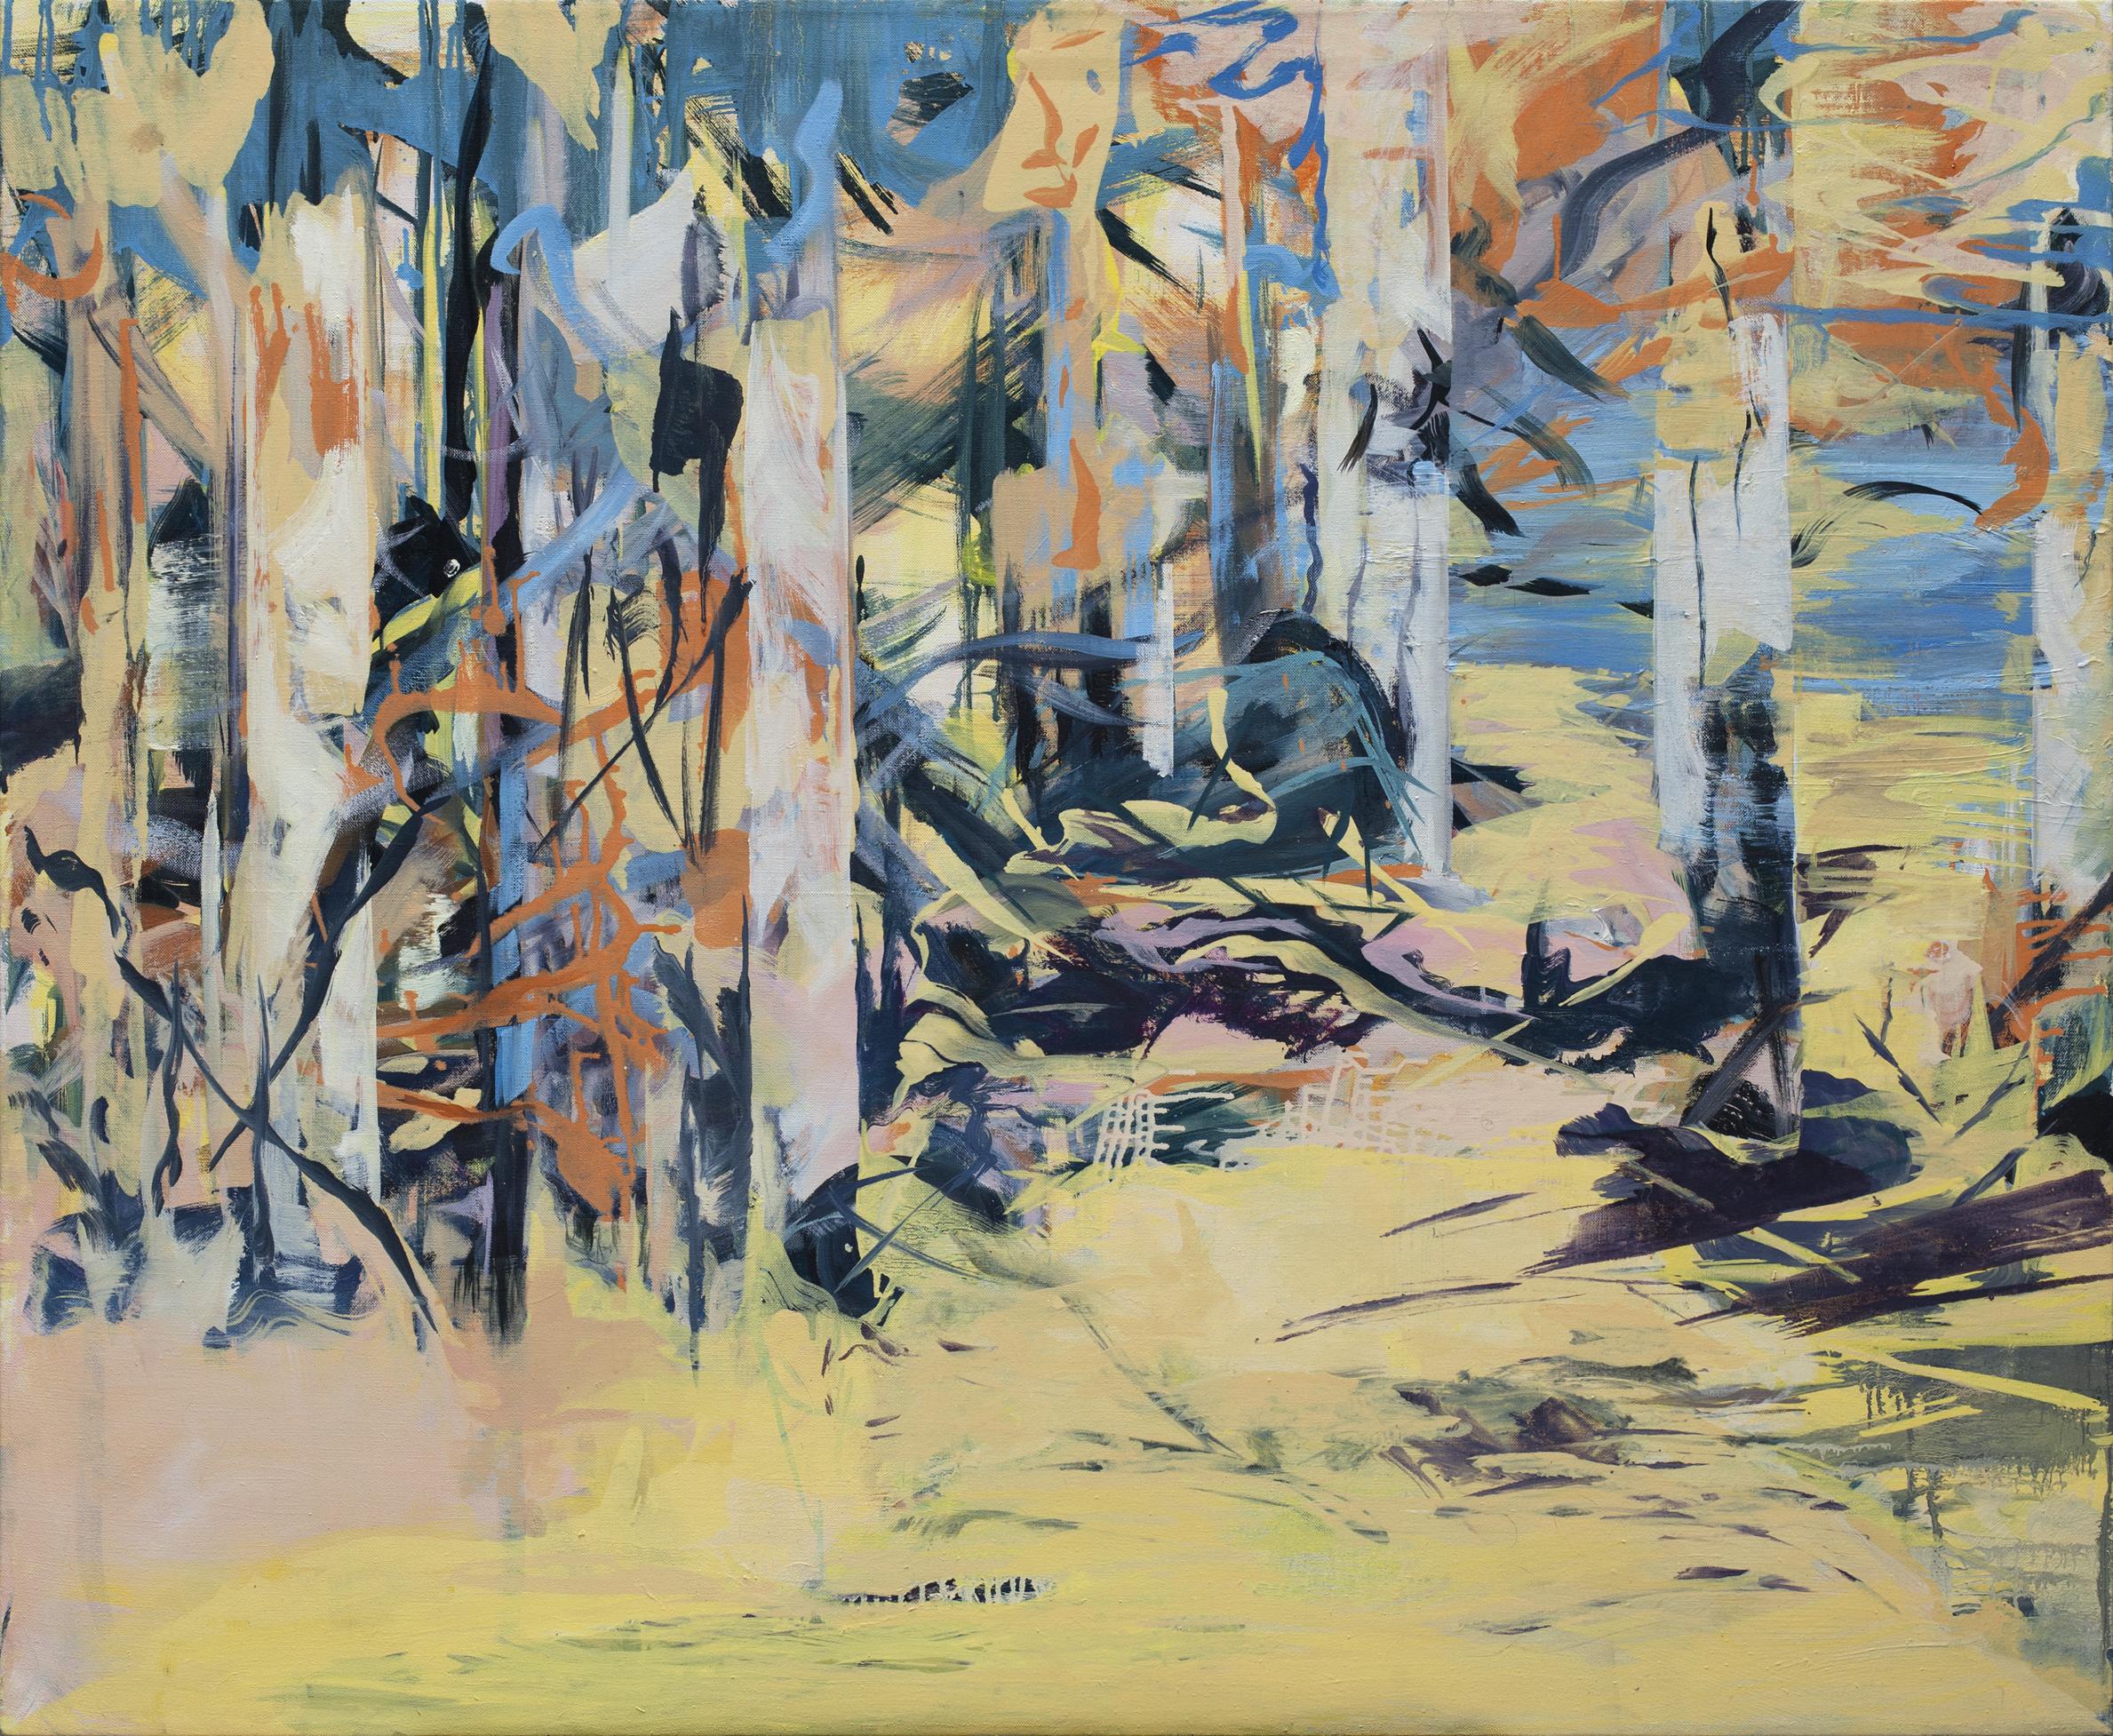 Verborgen ii, oil on canvas, 110 x 140 cm